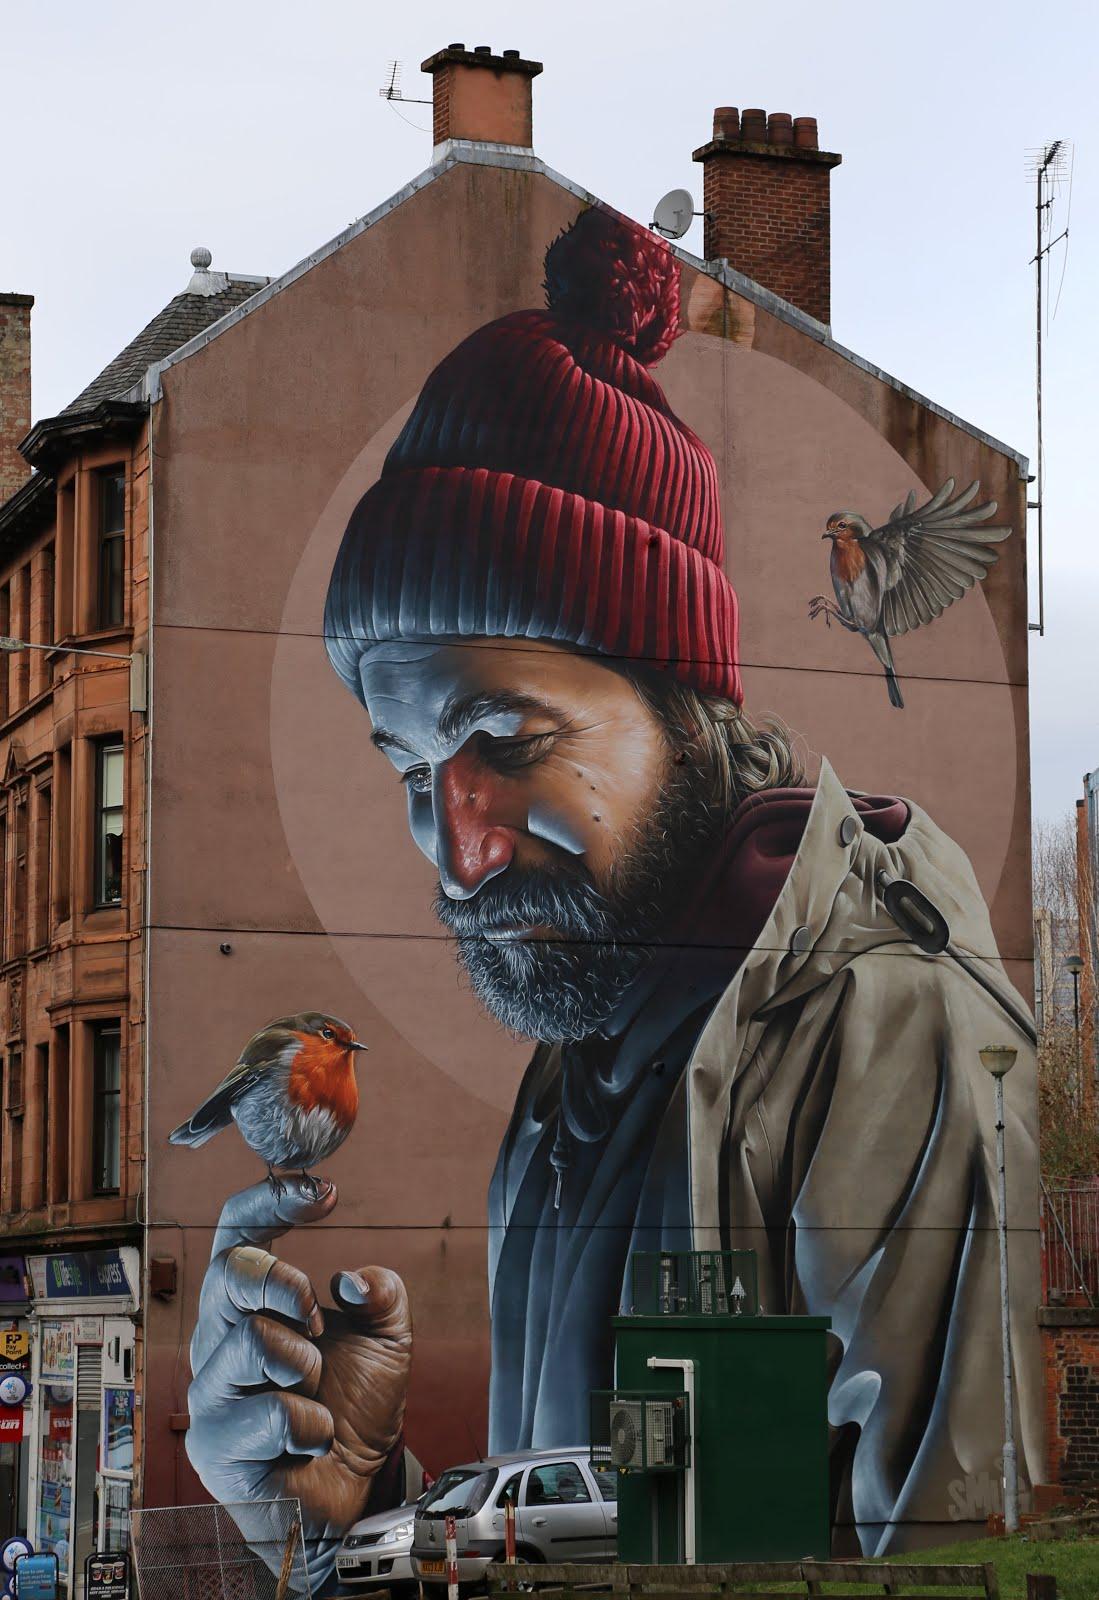 Sports Wall Murals Glasgow Punter Street Art Glasgow Murals Update